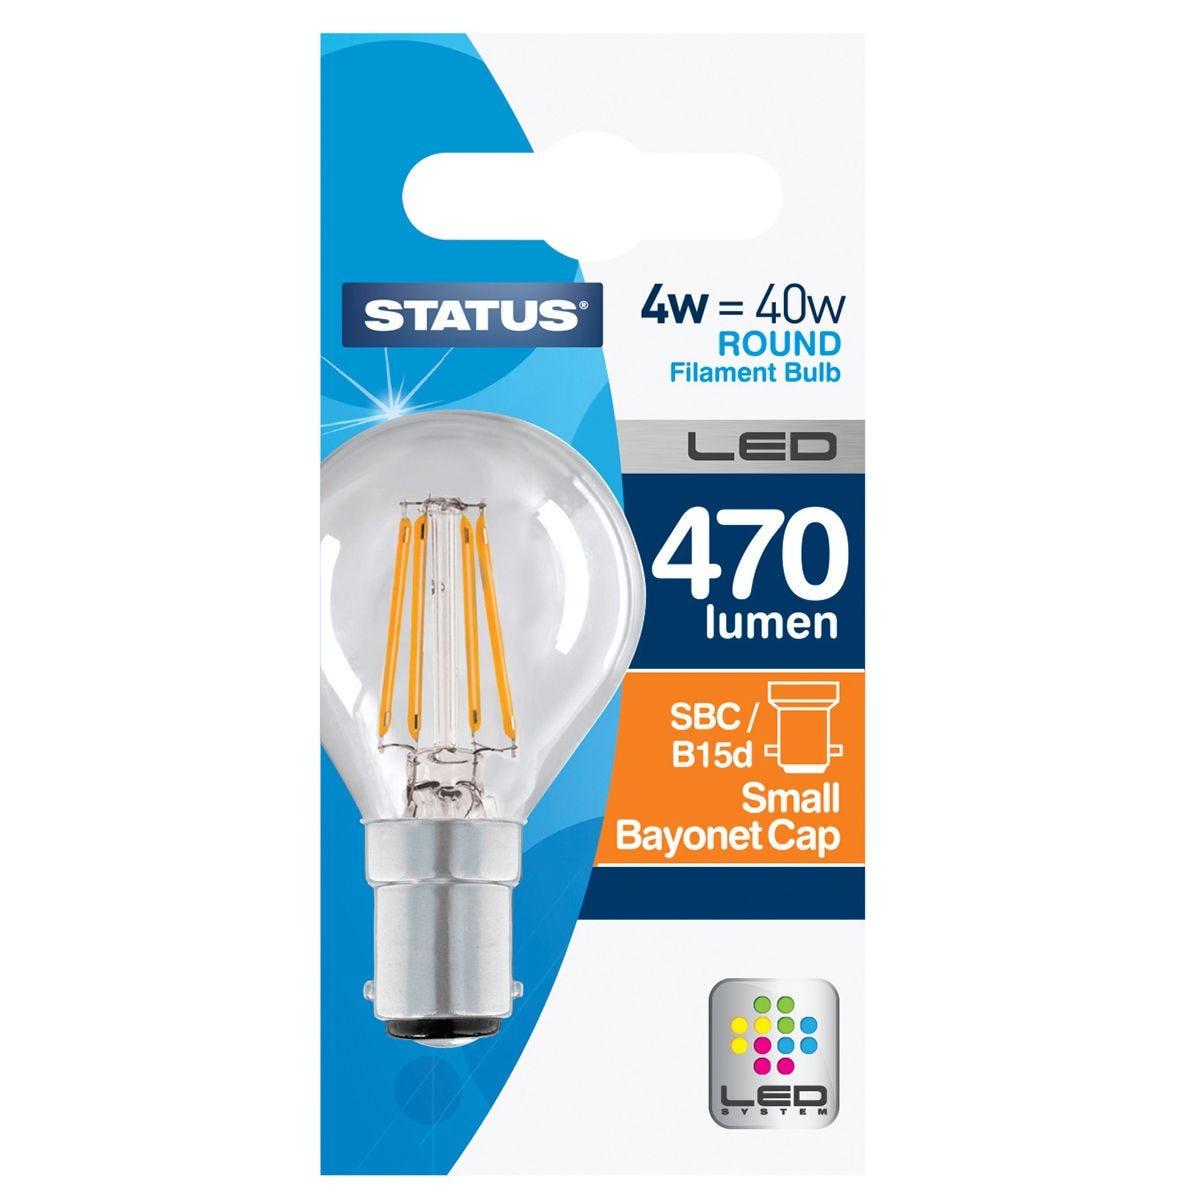 Status 4W=40W 470 lumens Filament LED Clear Round Bulb with Small Bayonet Cap - Warm White